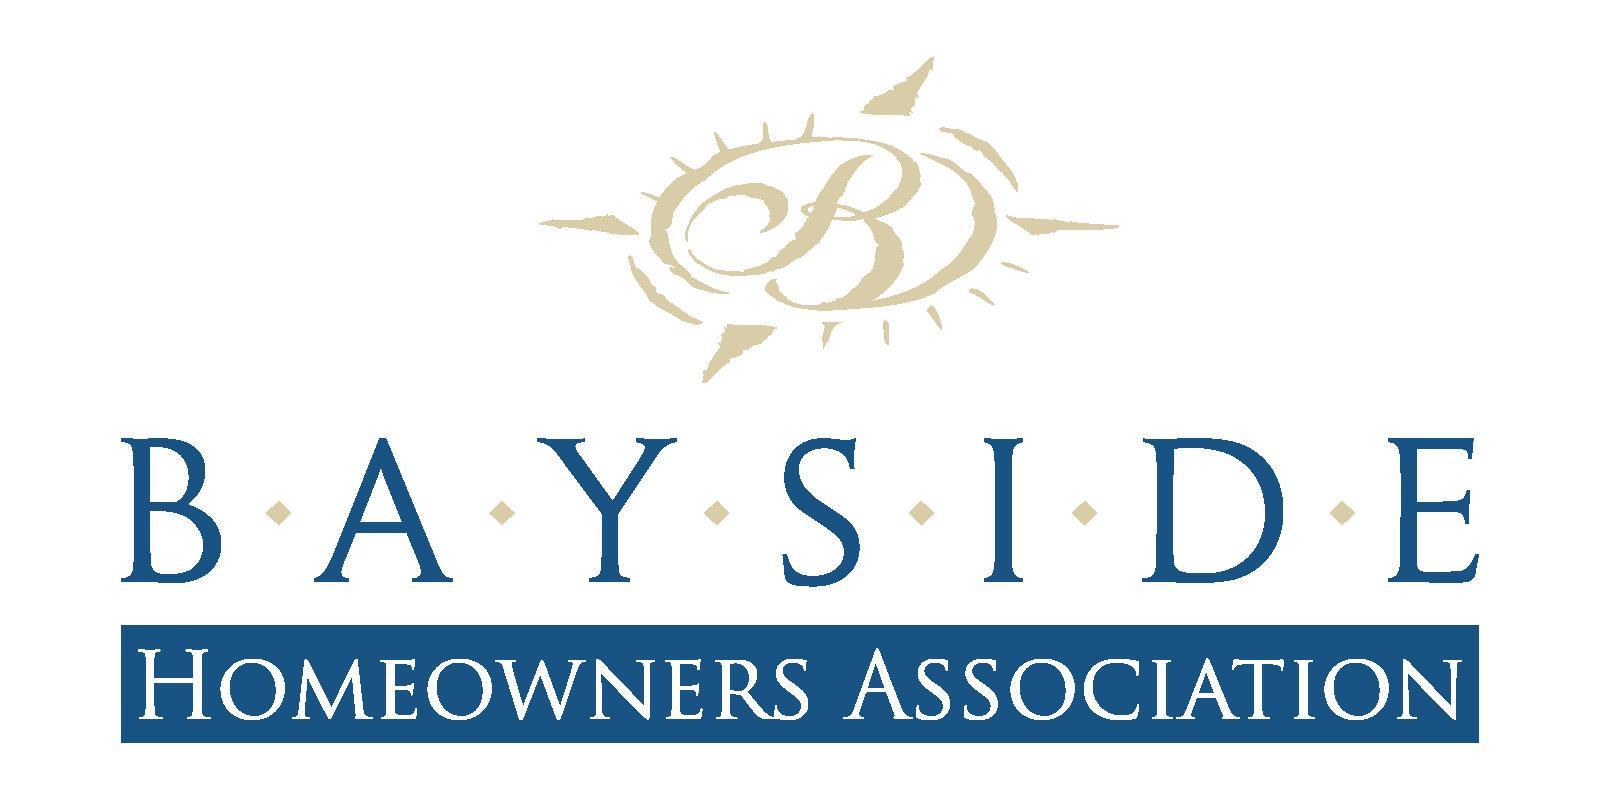 Bayside Community Master Assoc